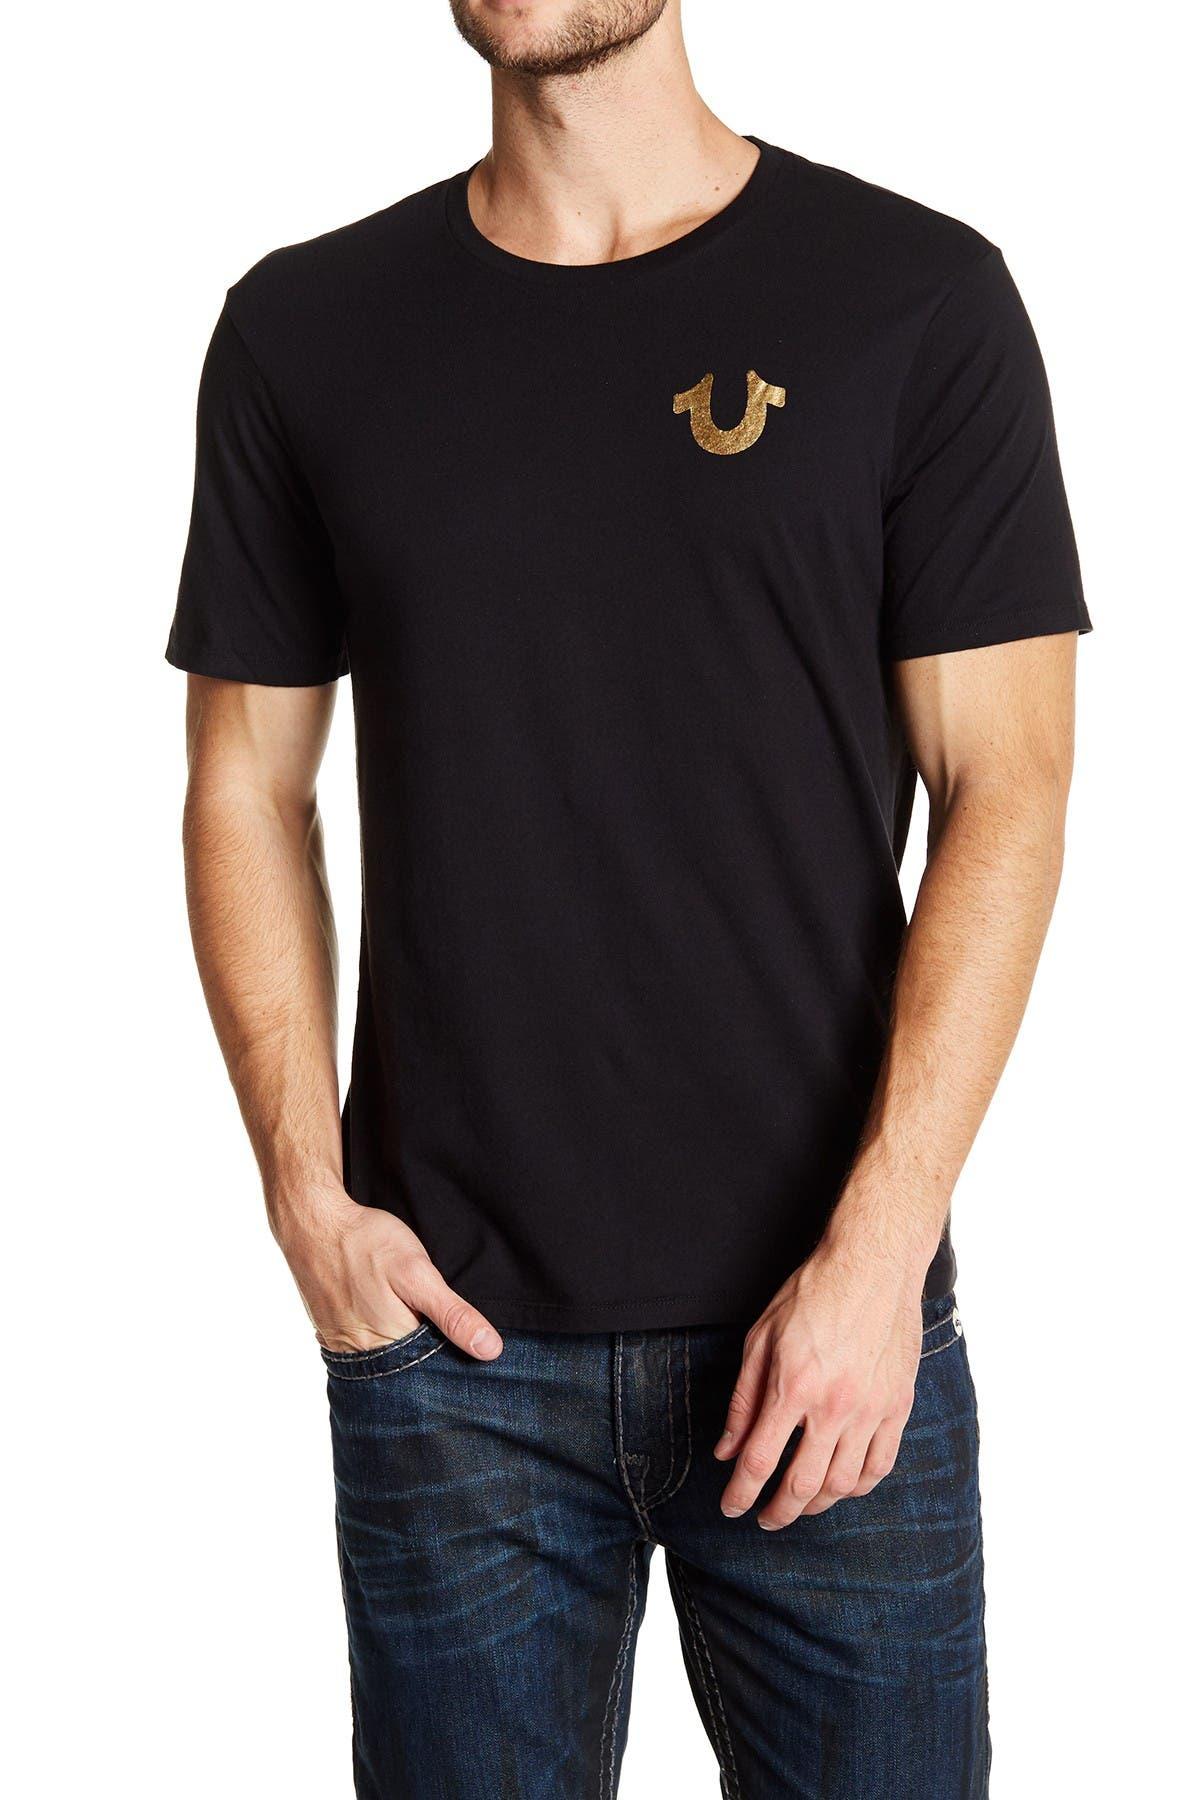 Image of True Religion Buddha Logo Crew Neck Graphic T-Shirt